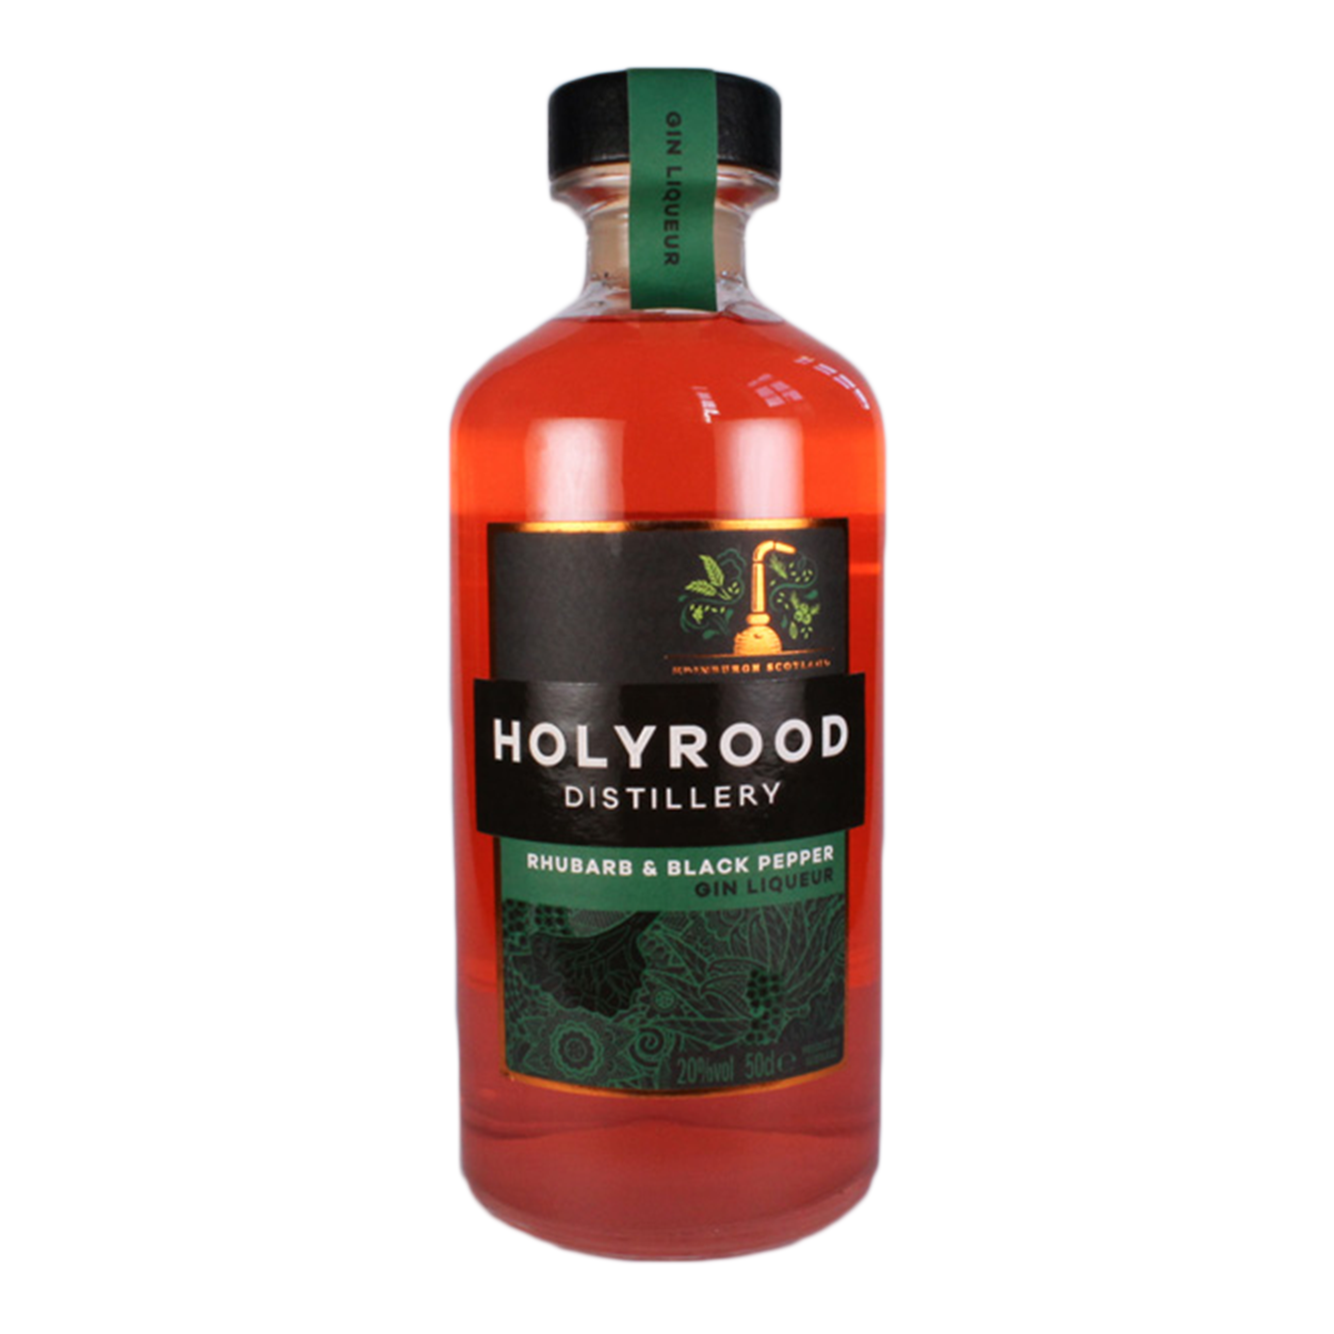 Holyrood Rhubarb & Black Pepper Gin Liqueur